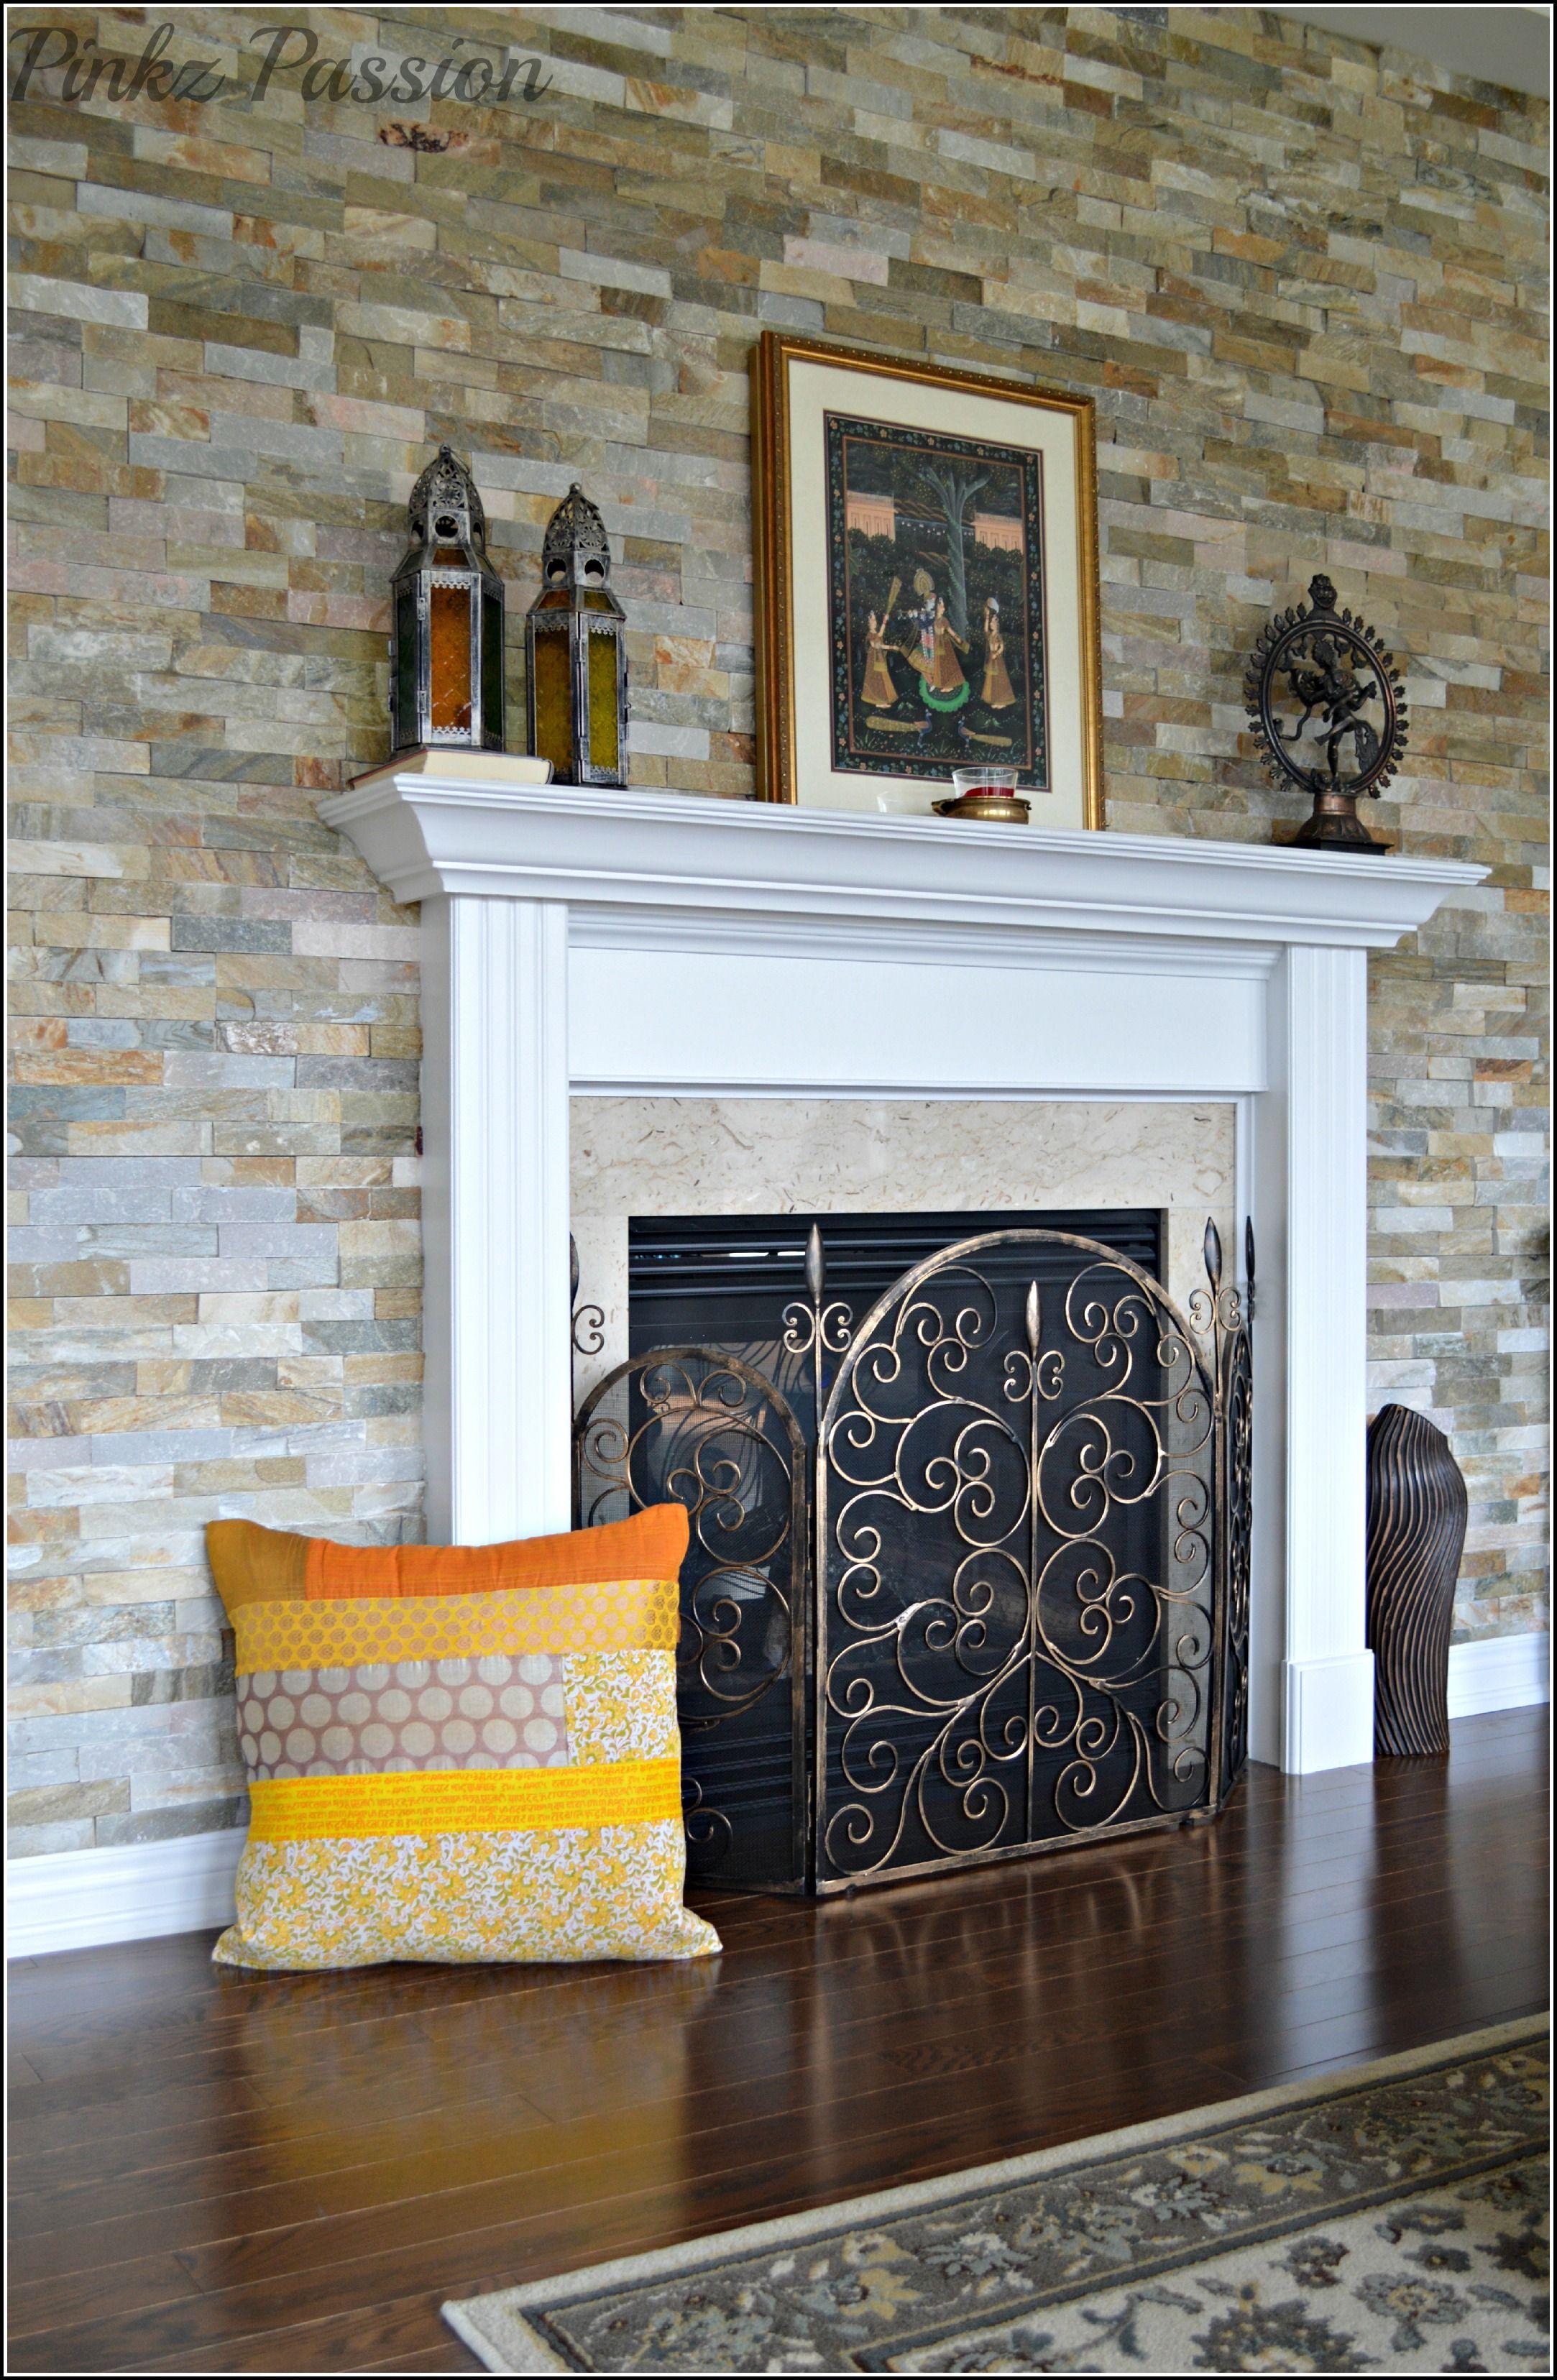 Home Decor Indian Home Decor Global Decor Brick Fireplace Decor Fireplace Mantel Decor Indian Home Decor Cottage Style Decor Indian Inspired Decor